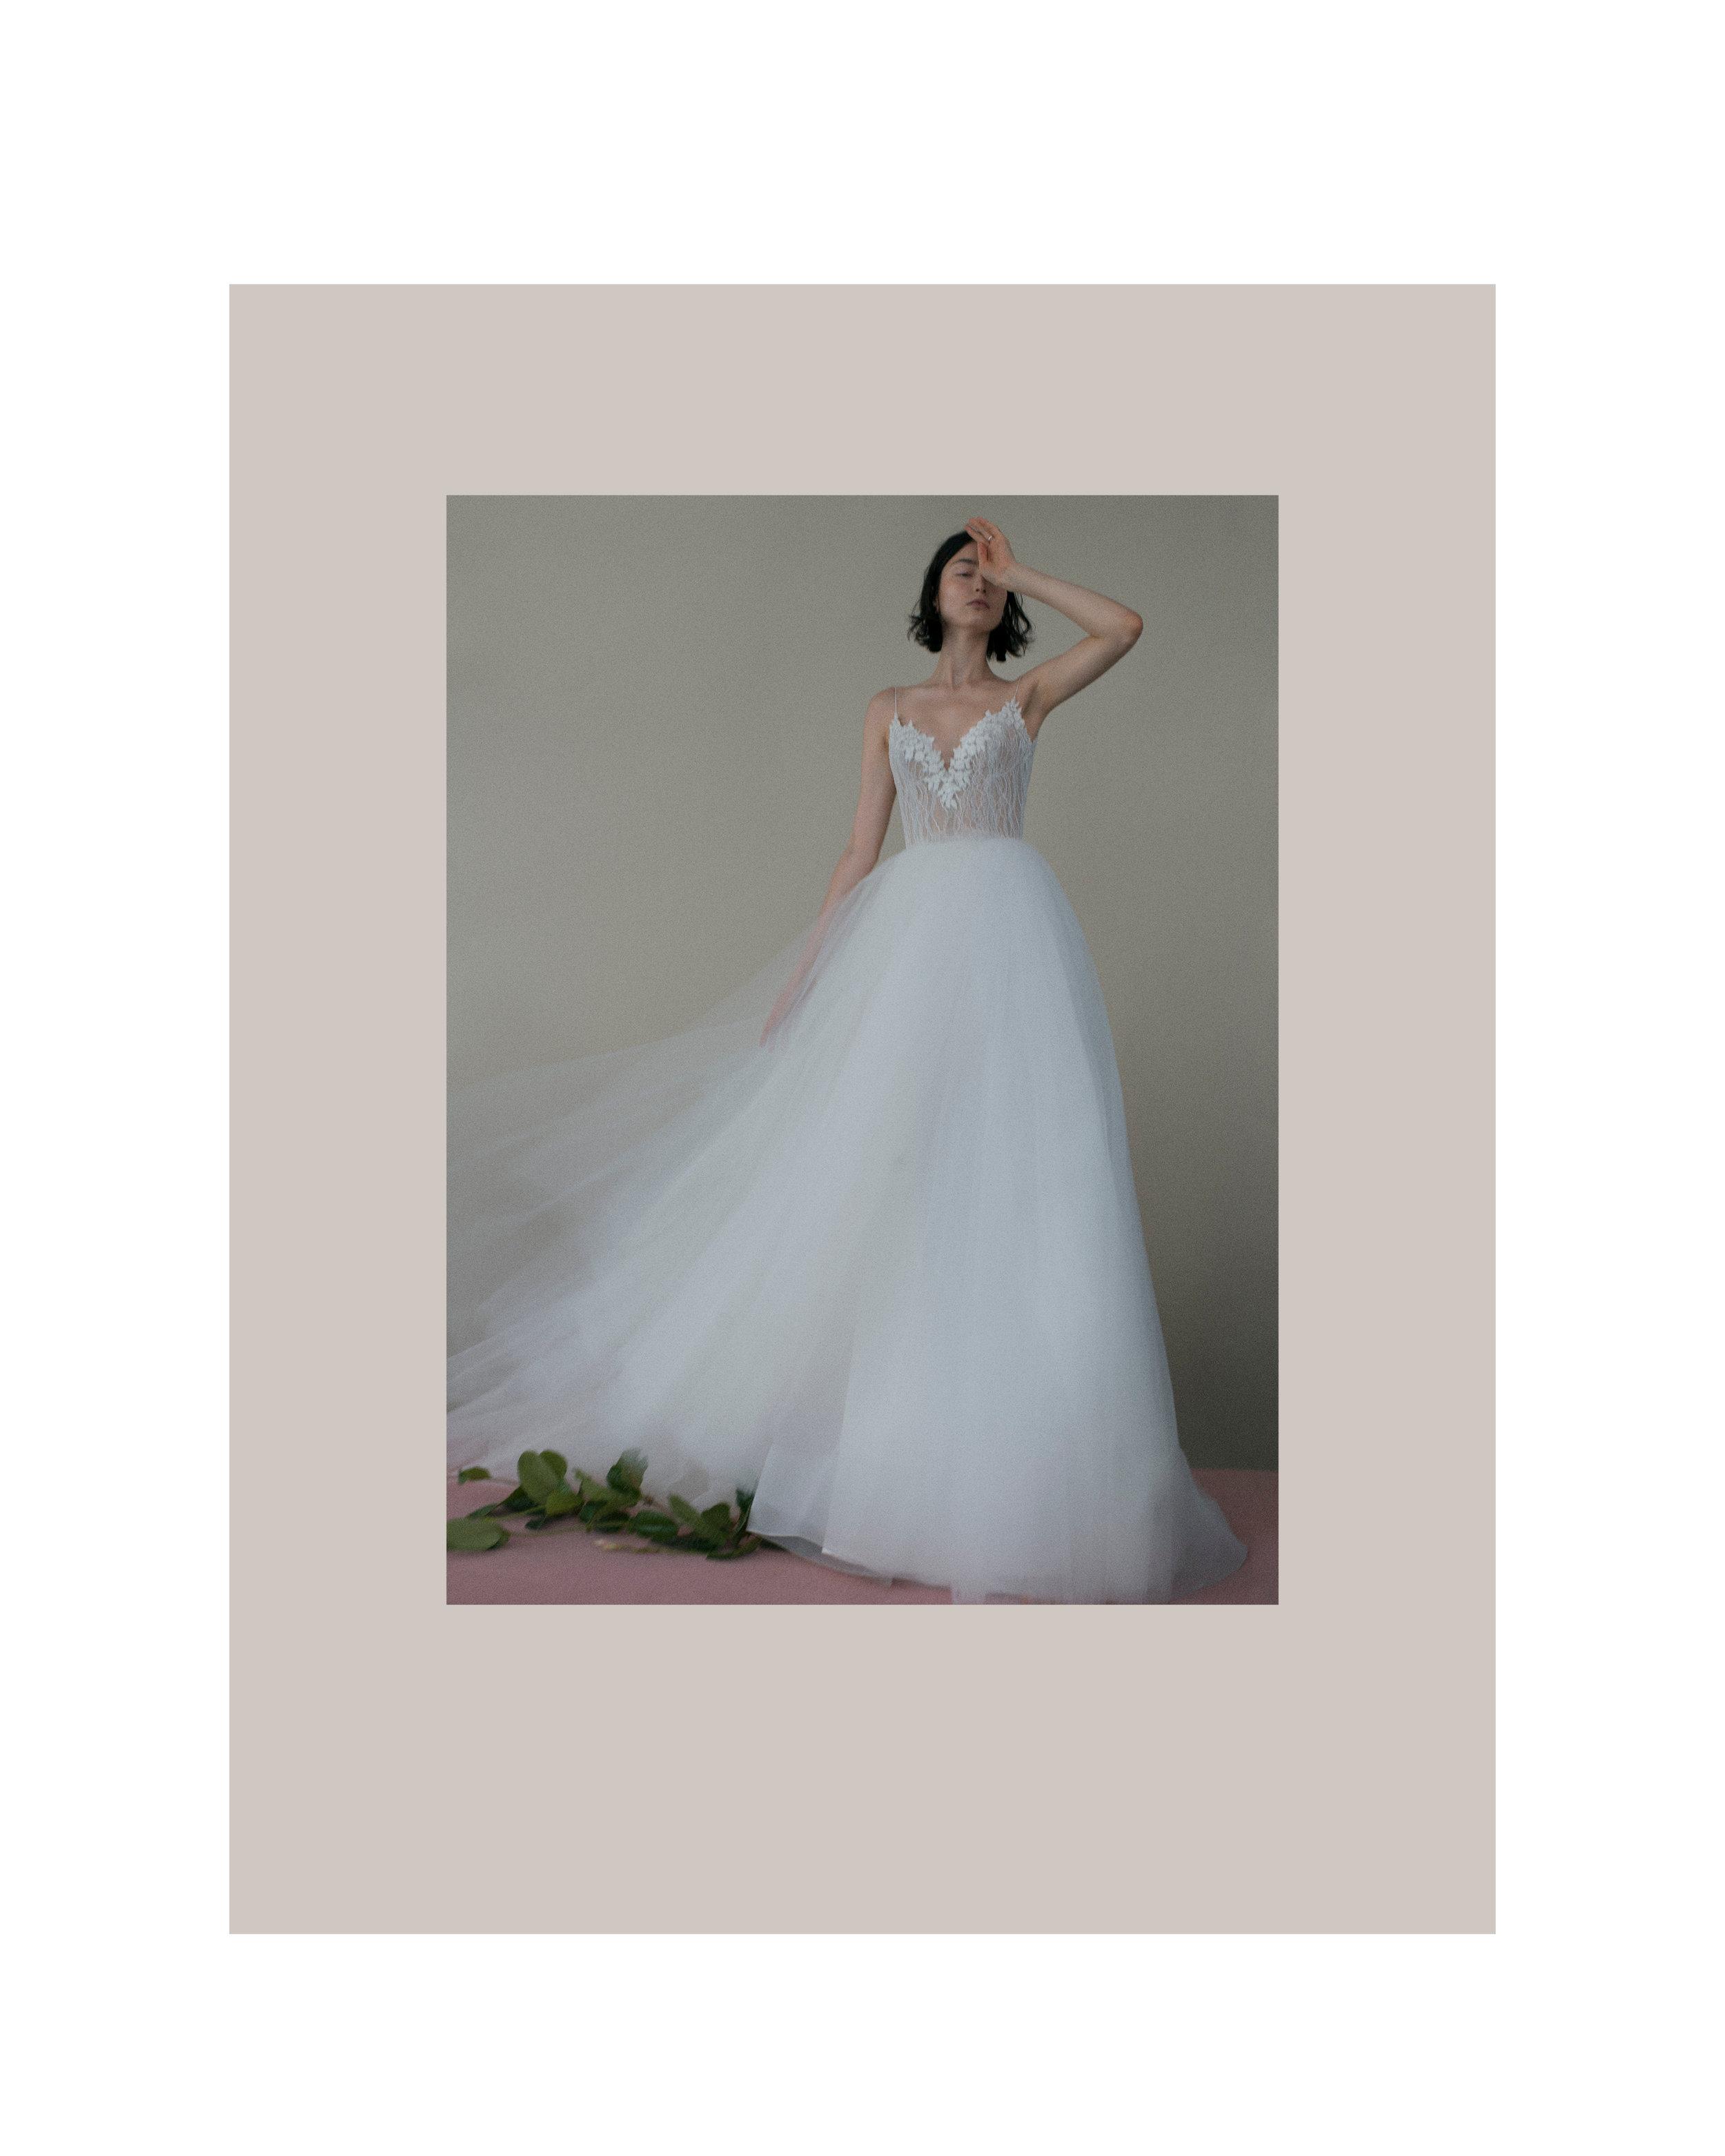 dominik_tarabanski_-_martha_stewart_weddings_sadia_saida_valieva_15.jpg